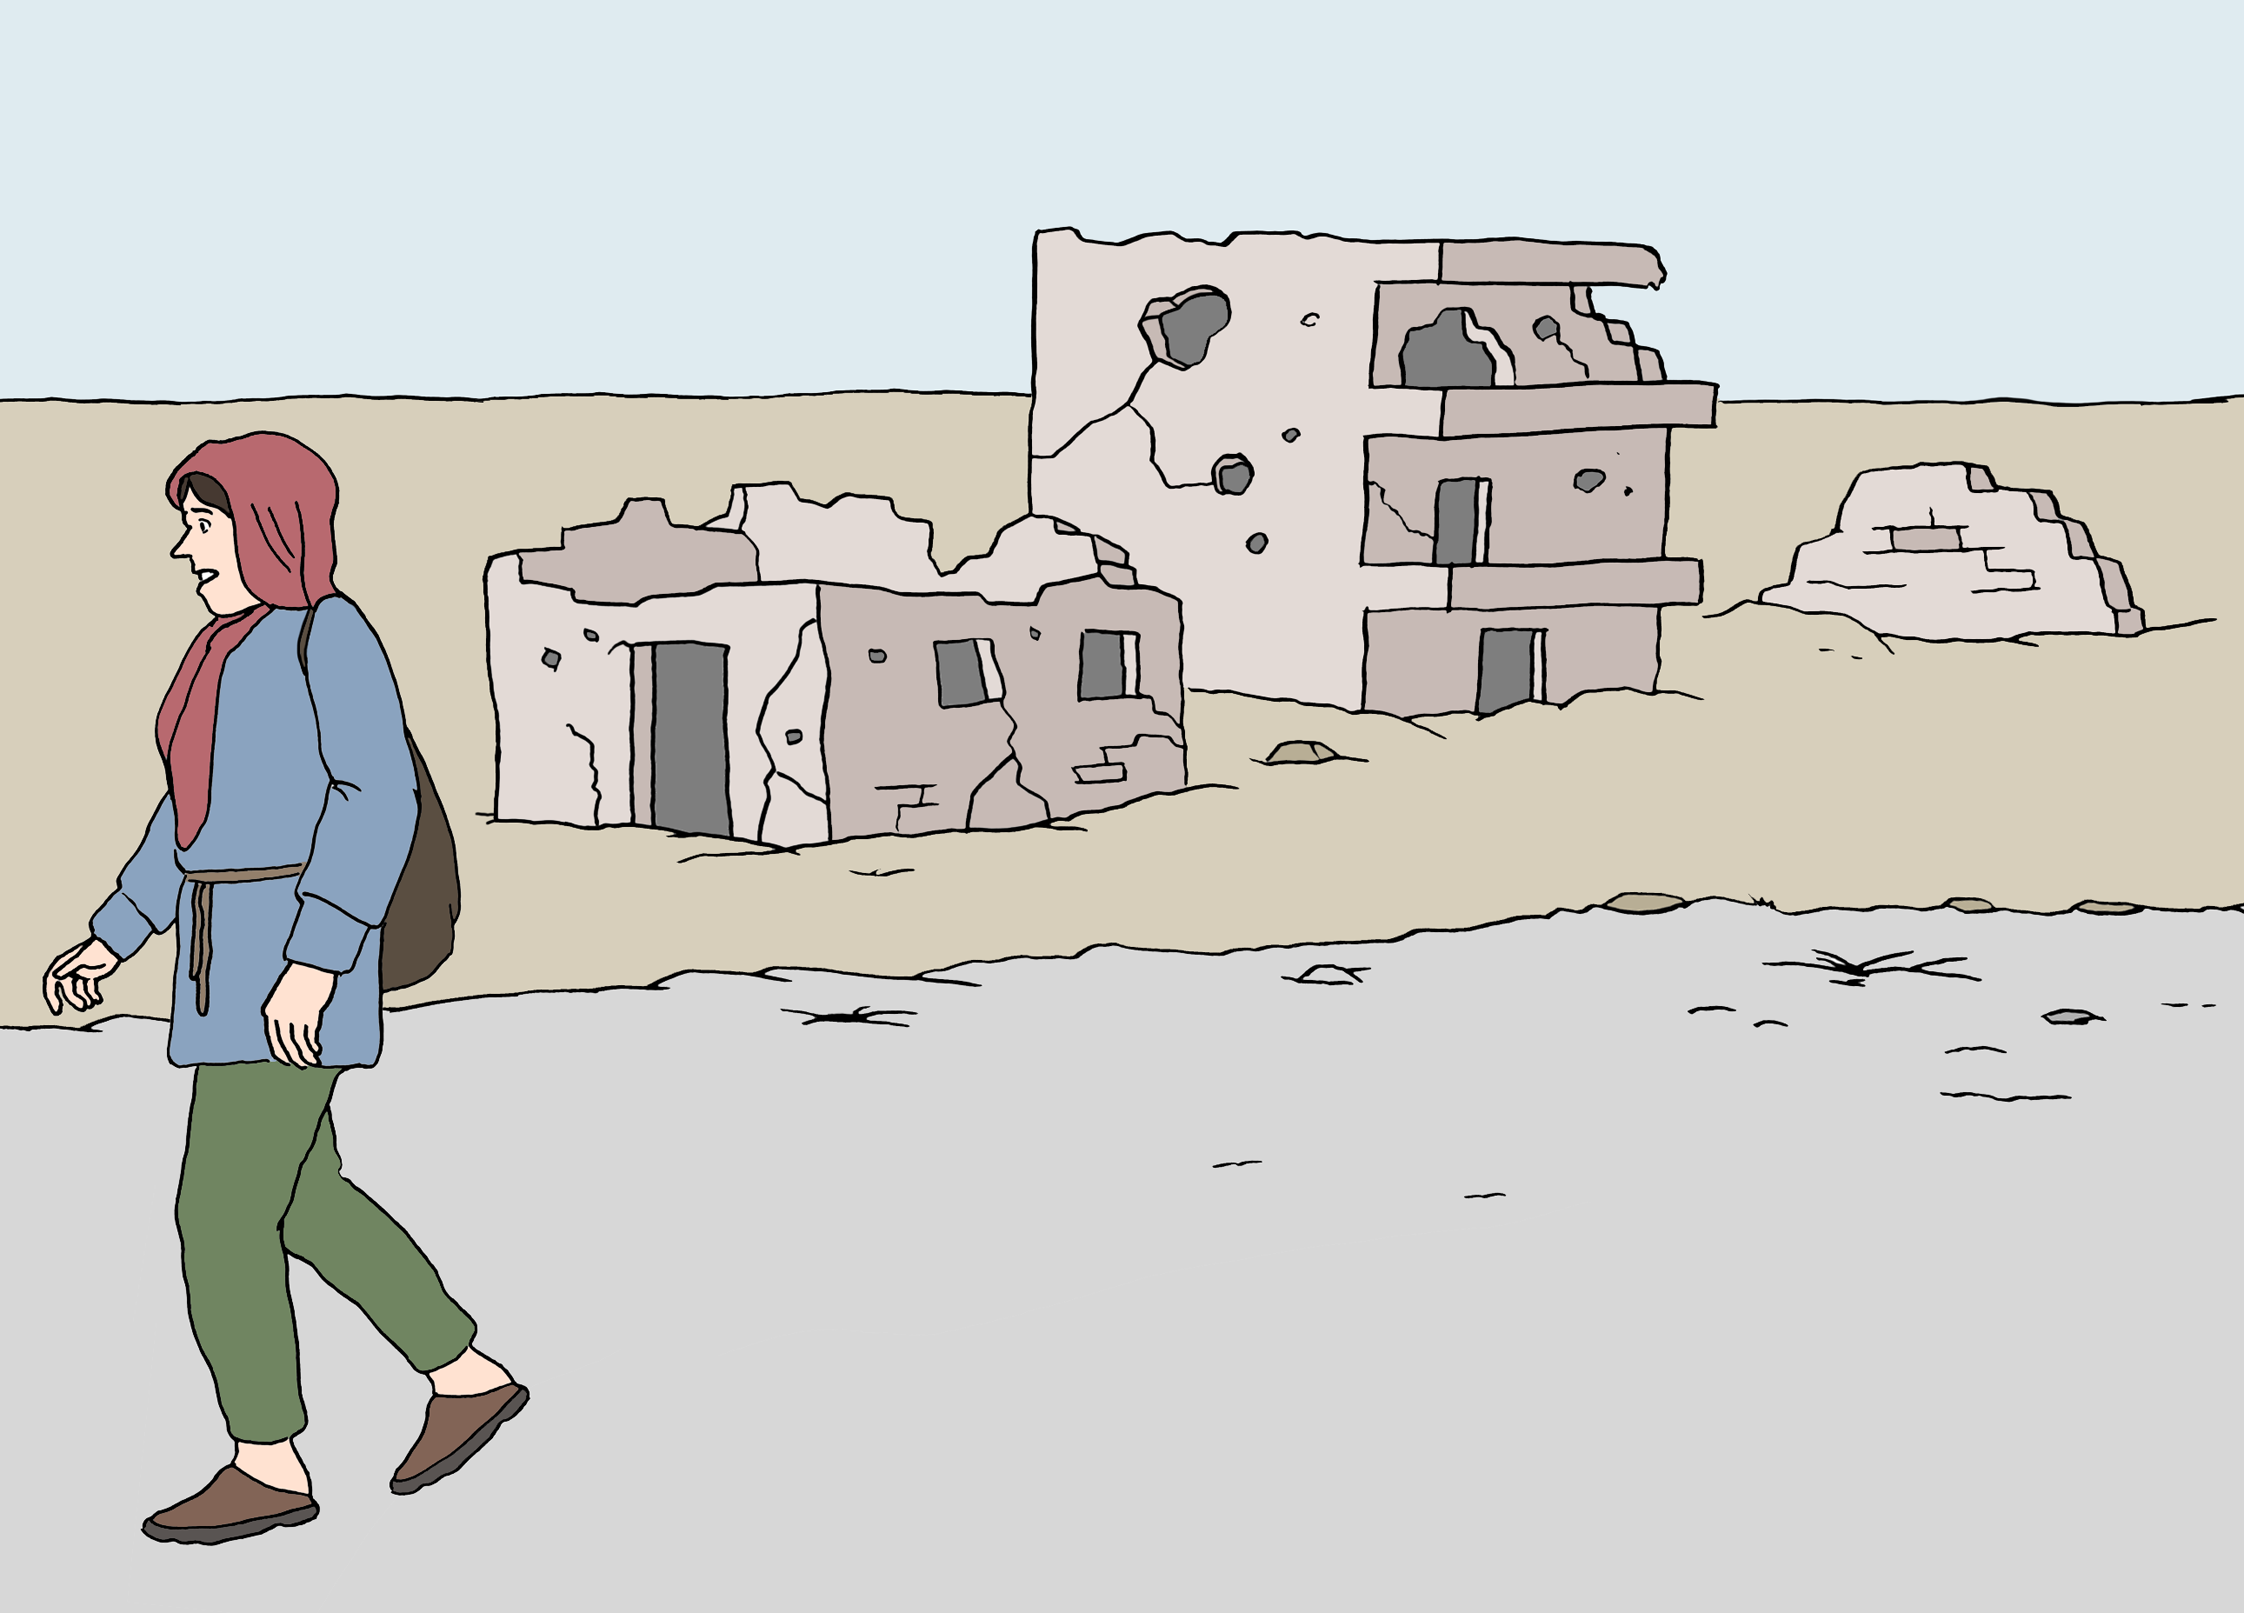 Flüchtling - Fugitive - Leichte Sprache